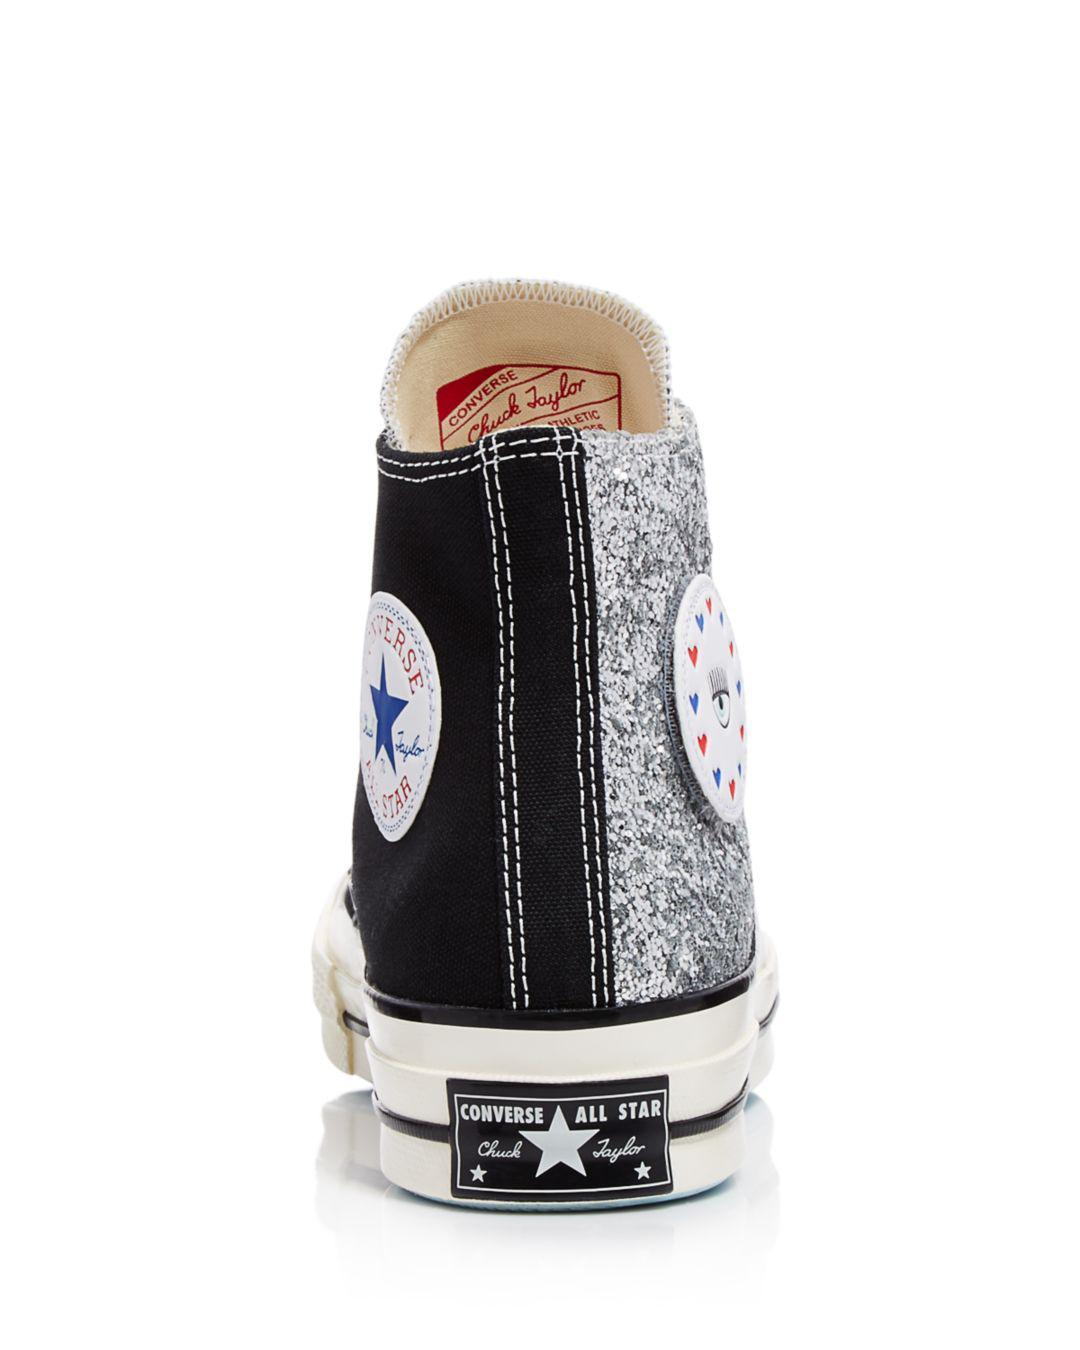 Converse X Chiara Ferragni Women's Chuck Taylor Glitter High Top ...